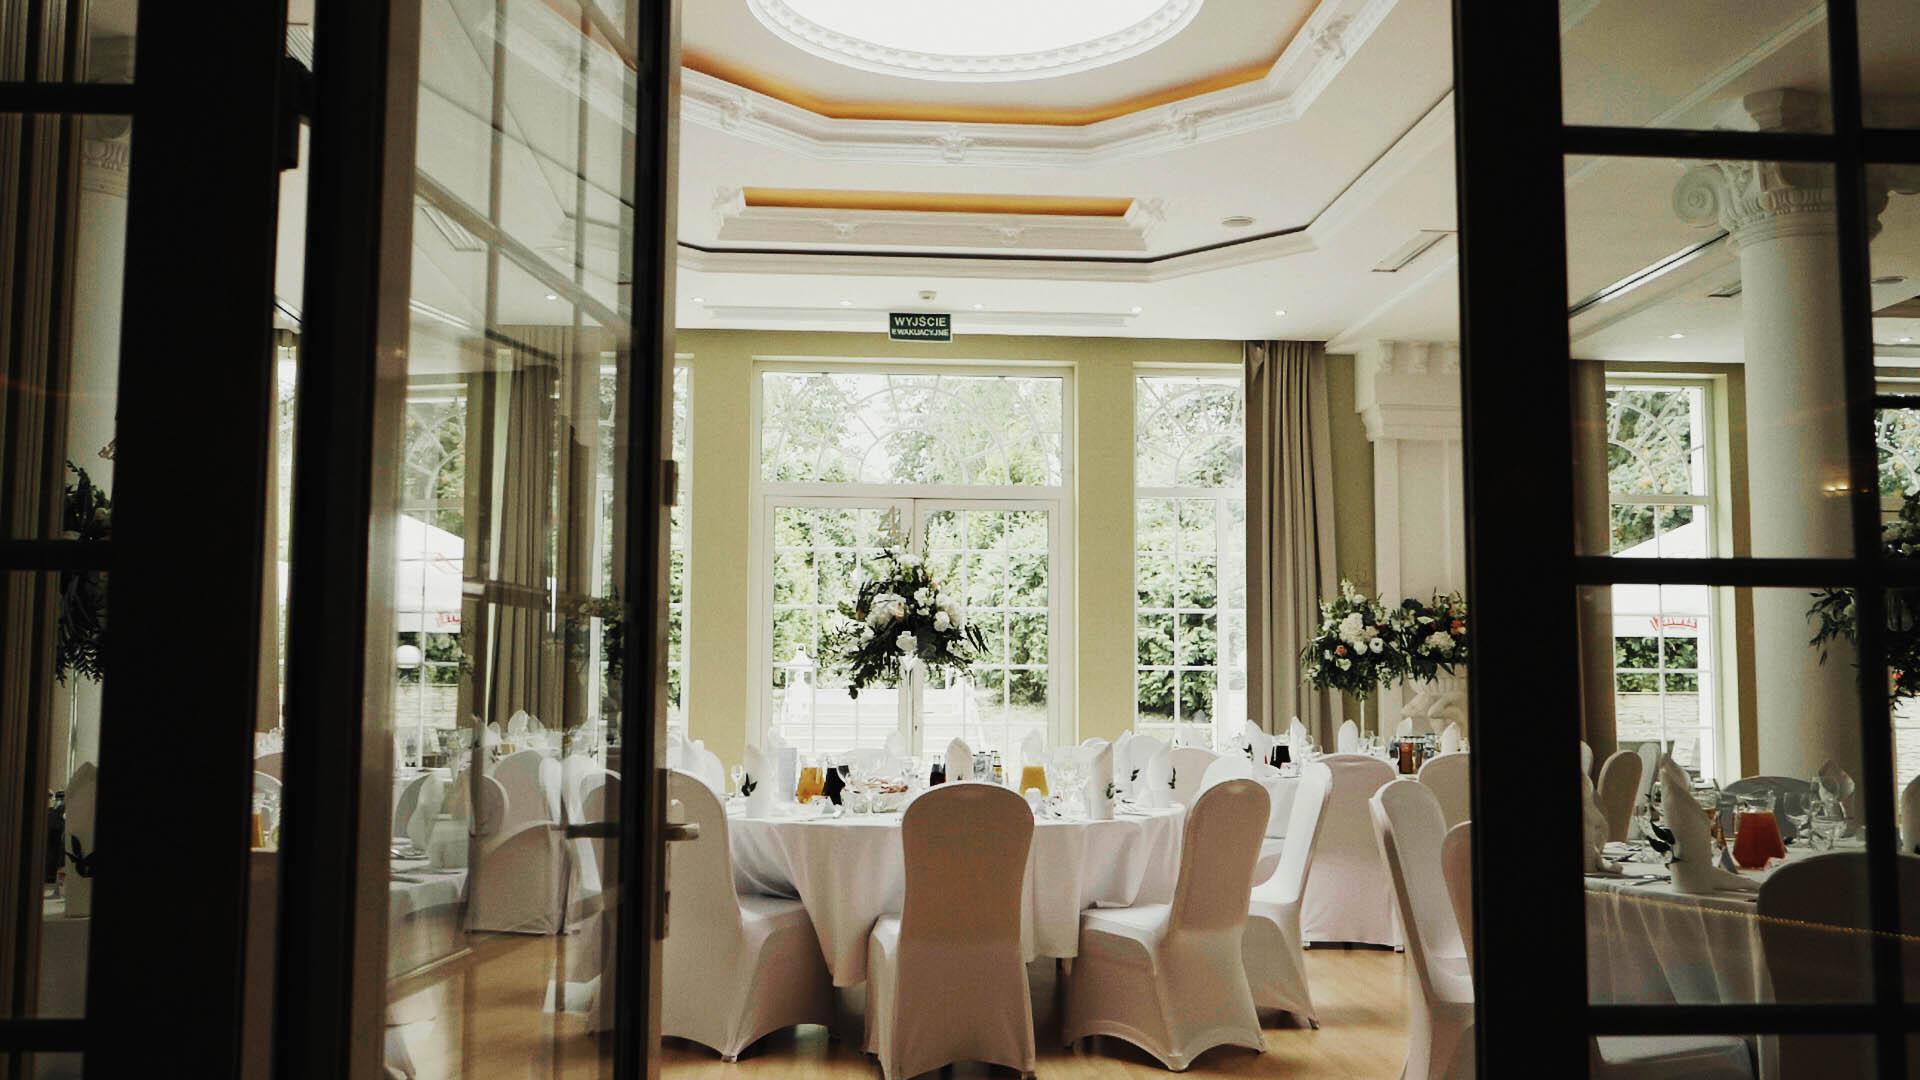 hotel-windsor-jachranka-wesele-ekskluzywne (7).jpg